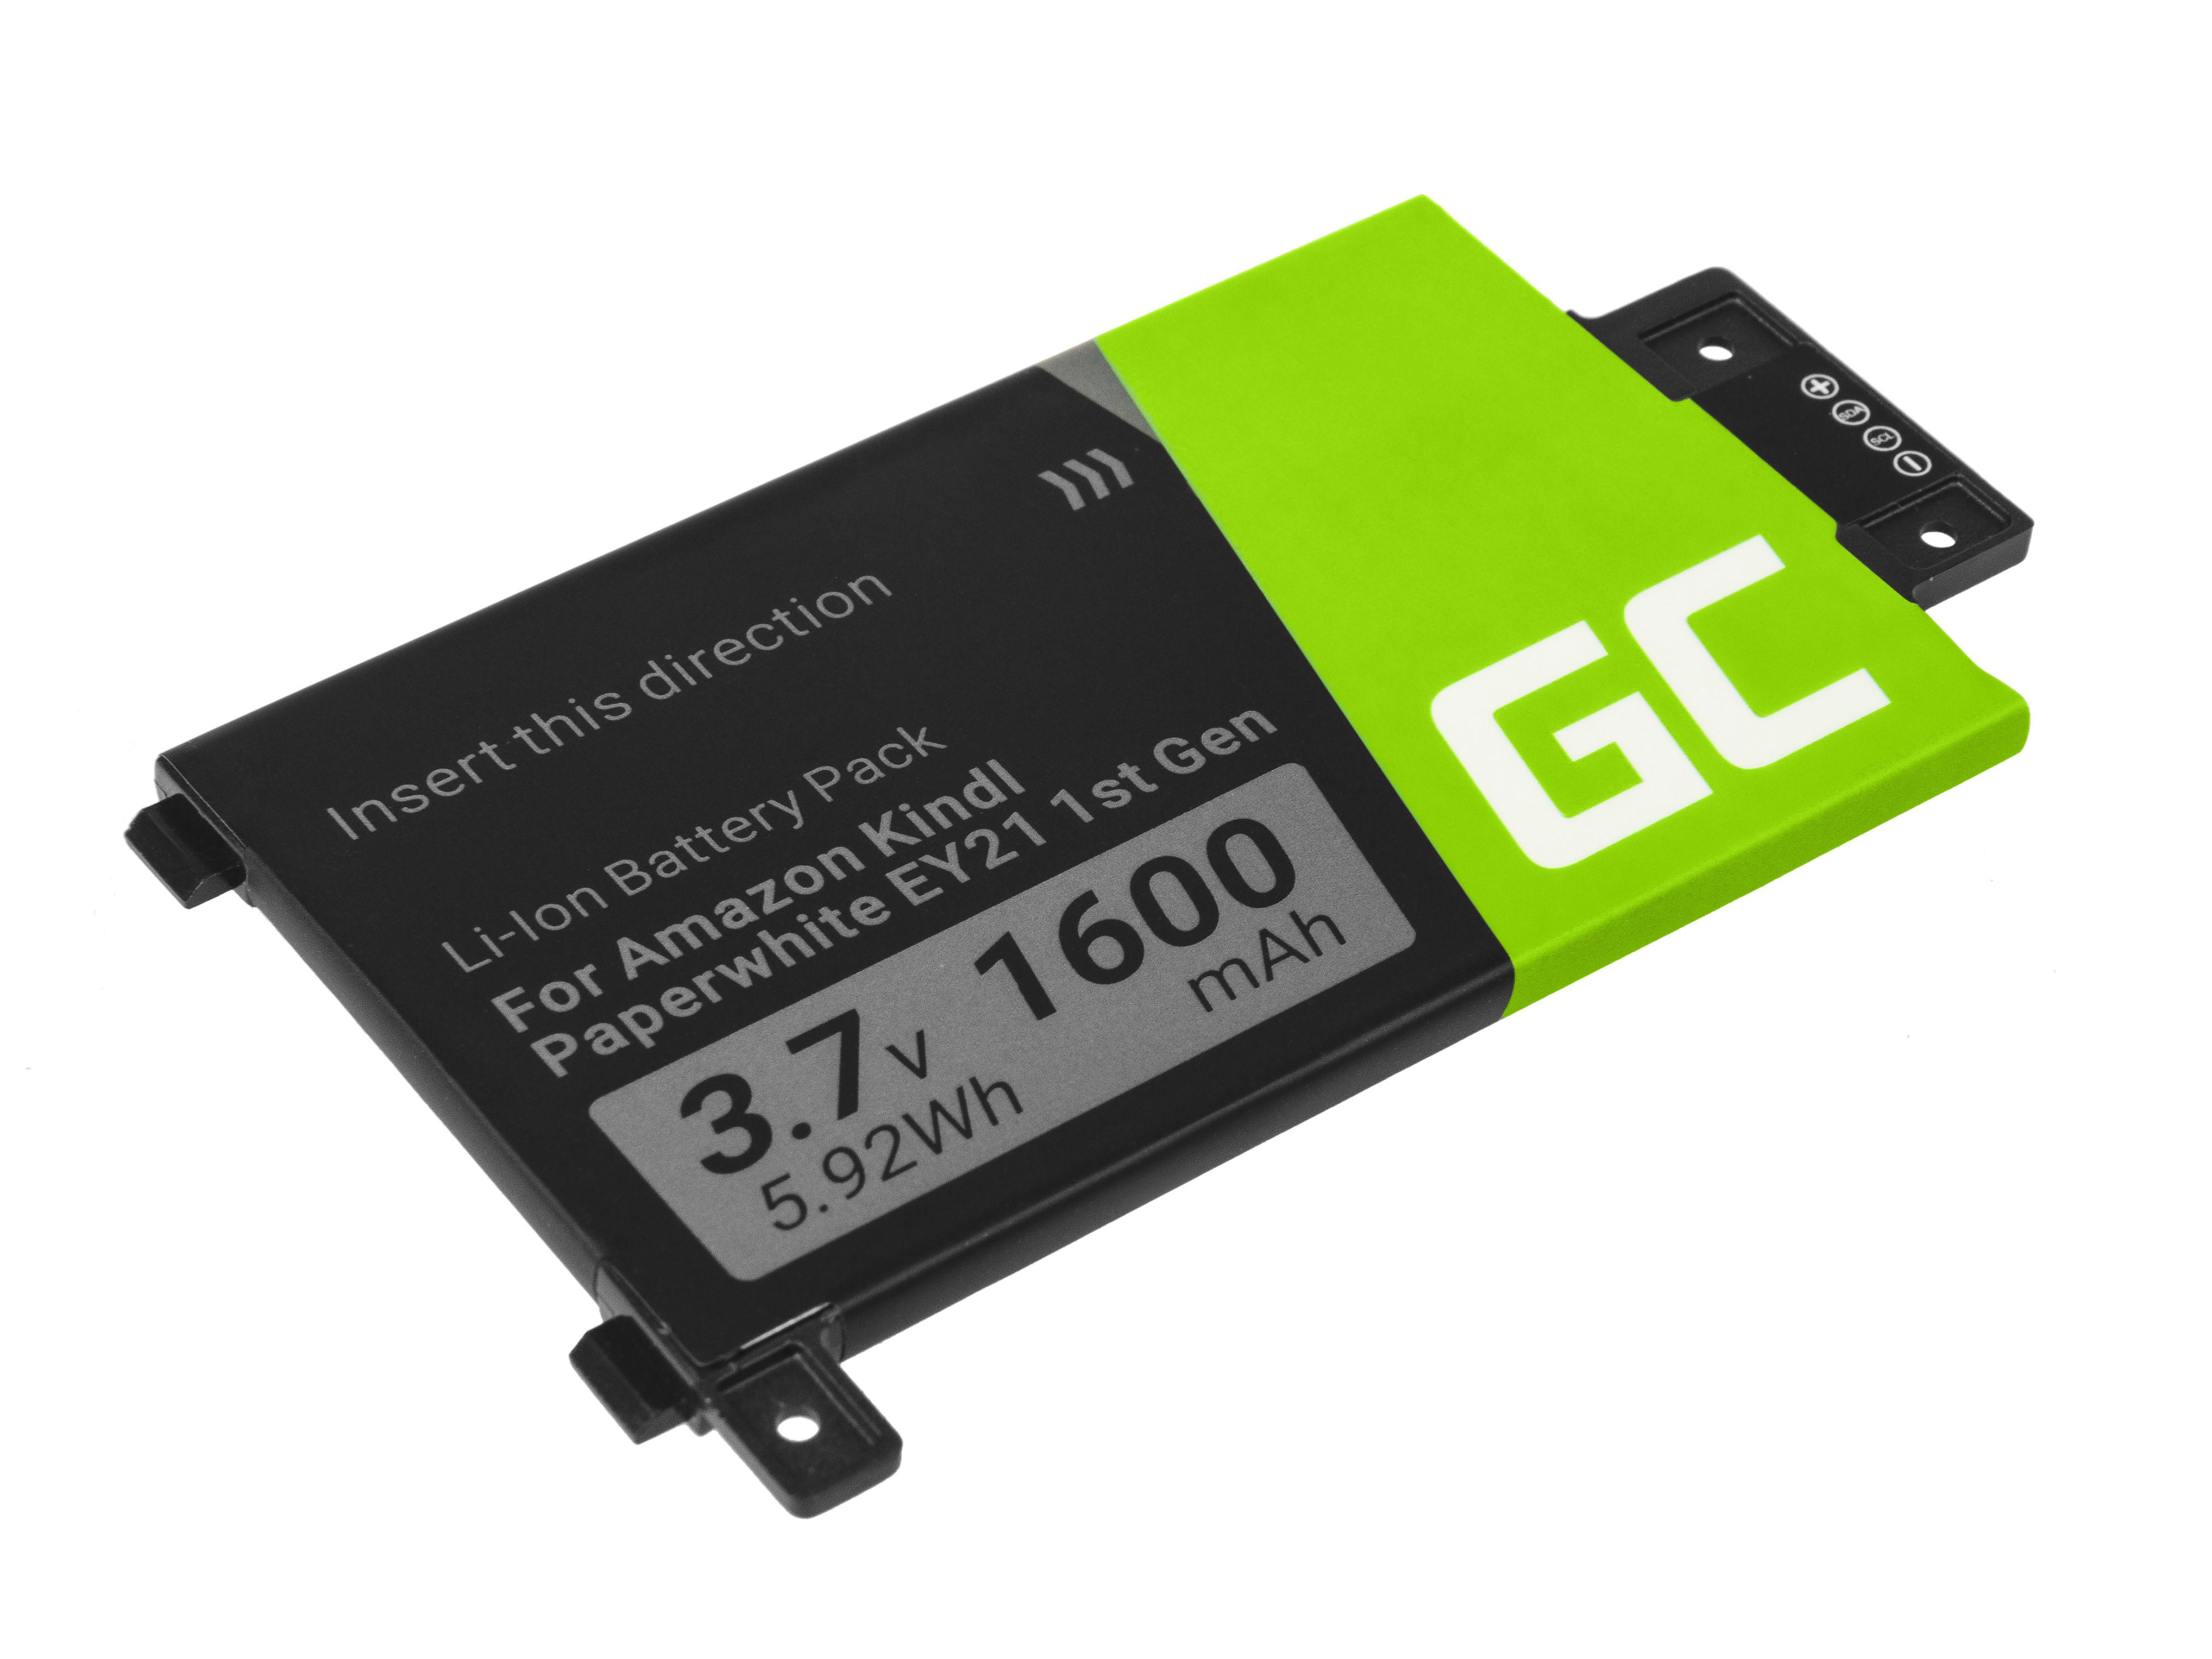 Baterie Green Cell 58-000008 pro e-book Amazon Kindle Paperwhite I 2012 1600mAh Li-ion - neoriginální